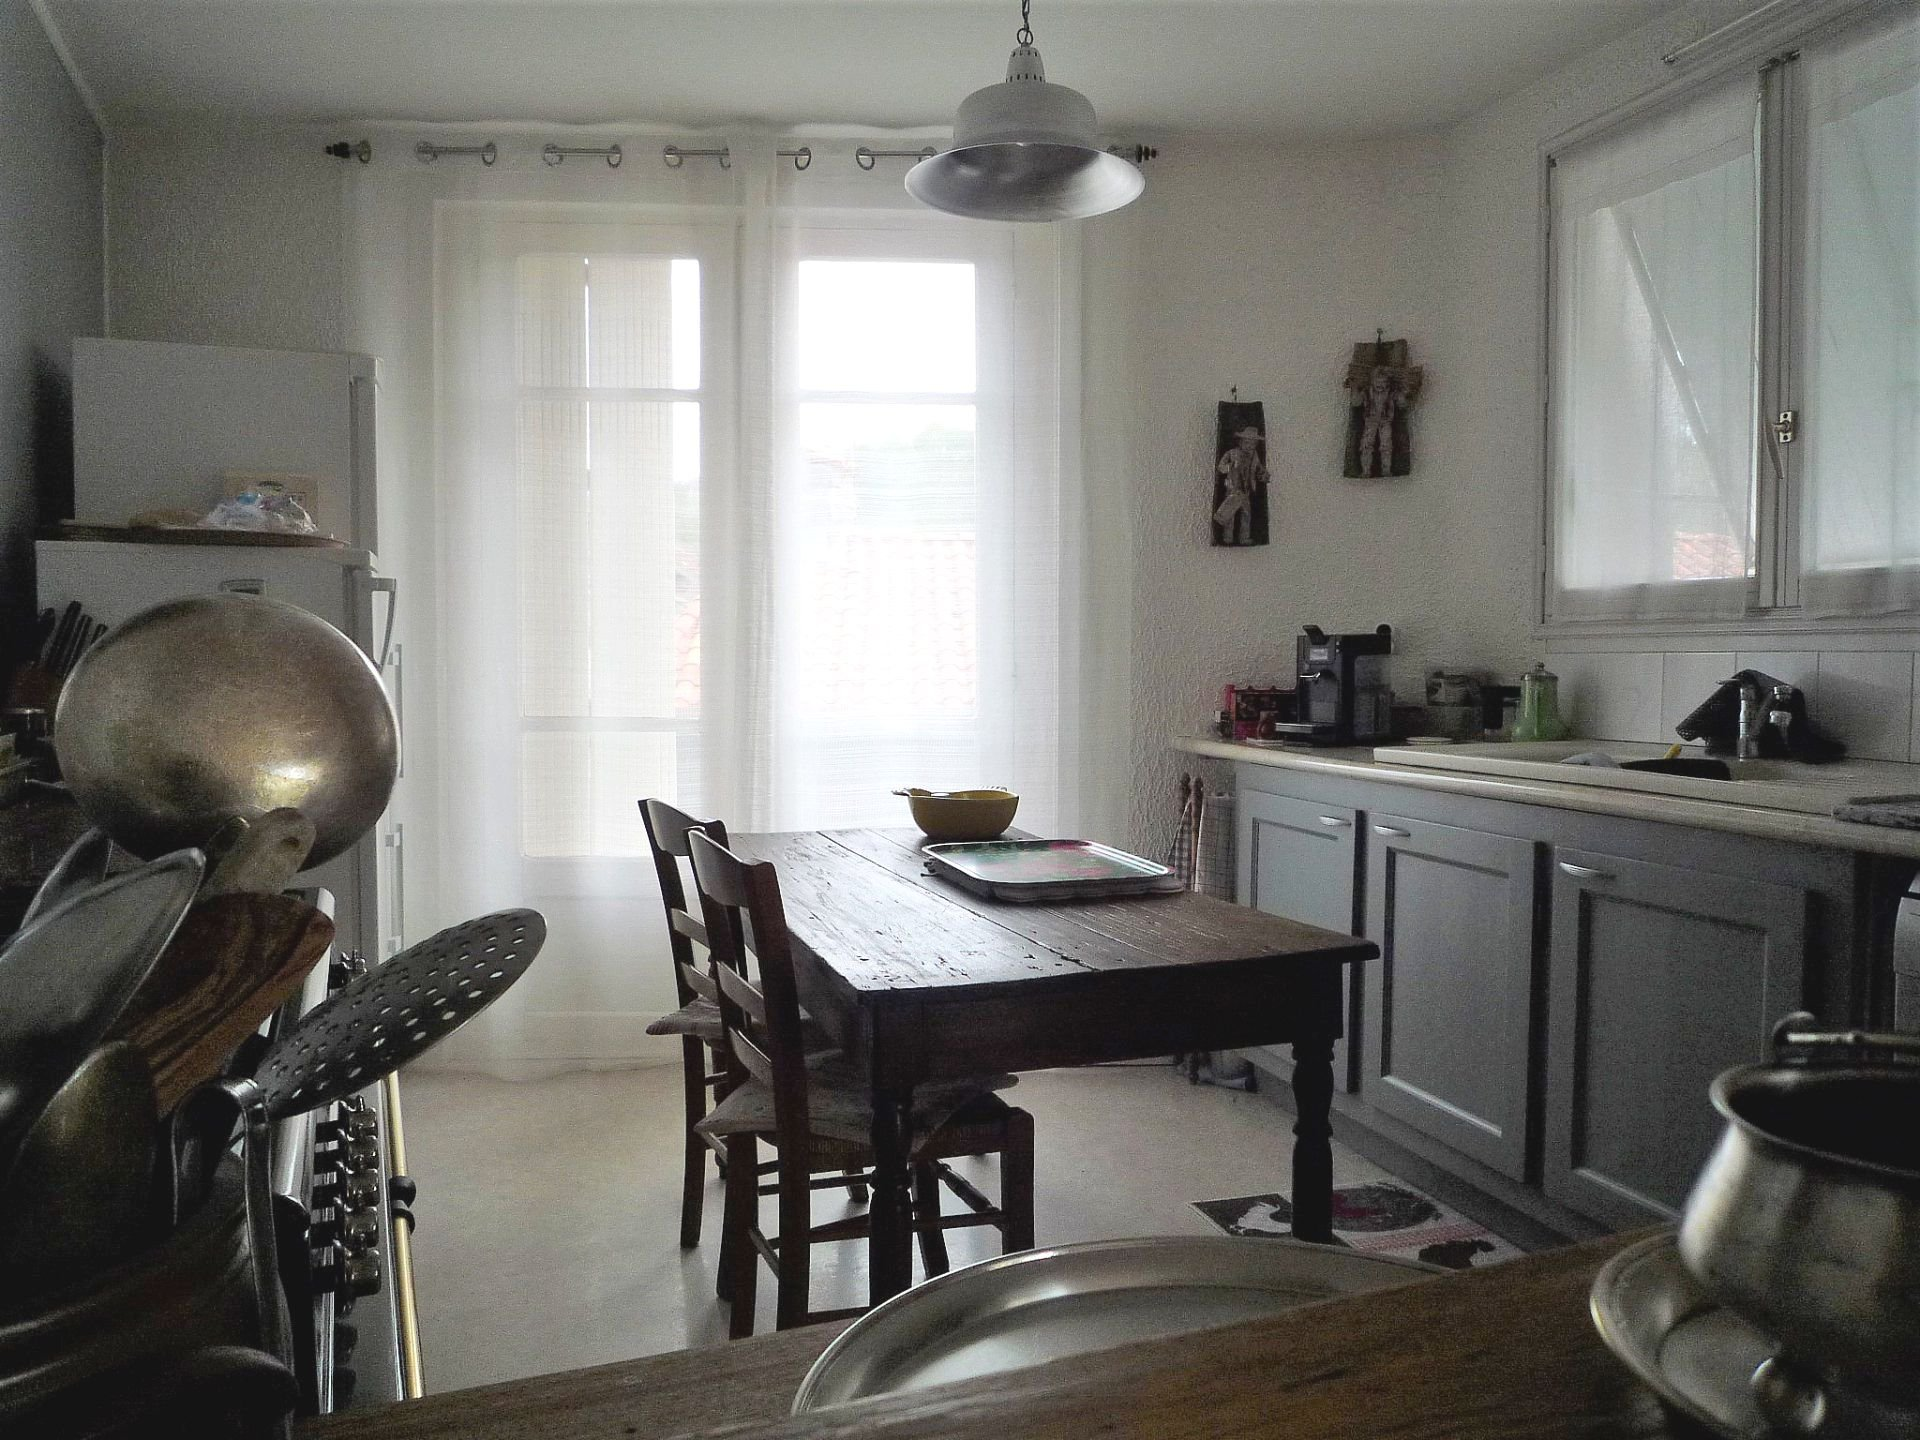 Appartement spacieux et coquet